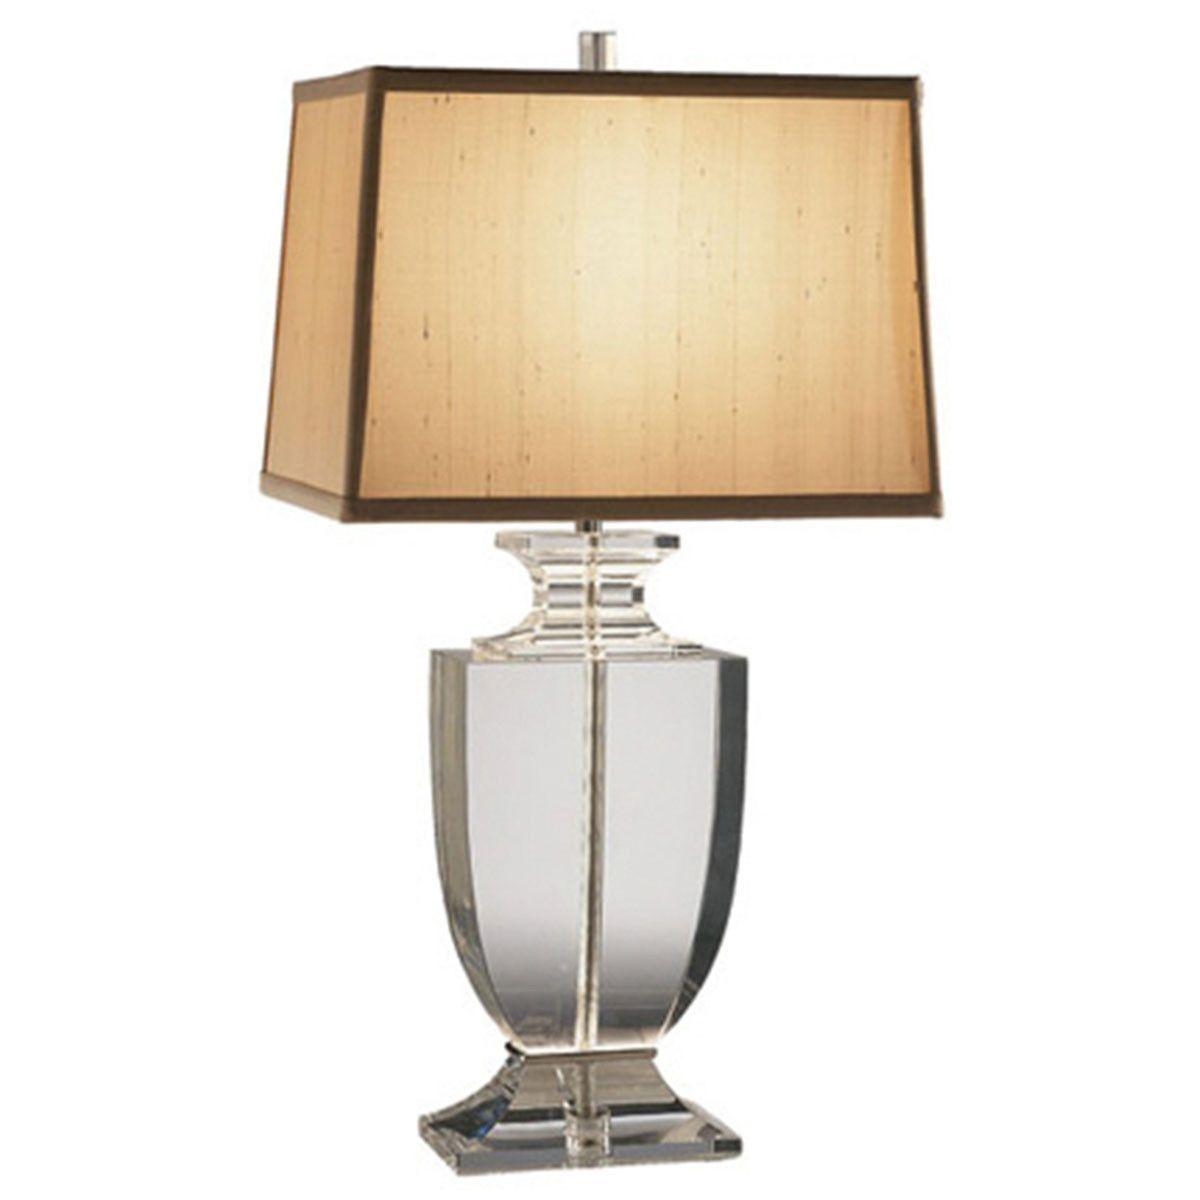 Robert Abbey Artemis Table Lamp In 2020 Crystal Table Lamps Table Lamp Lamp